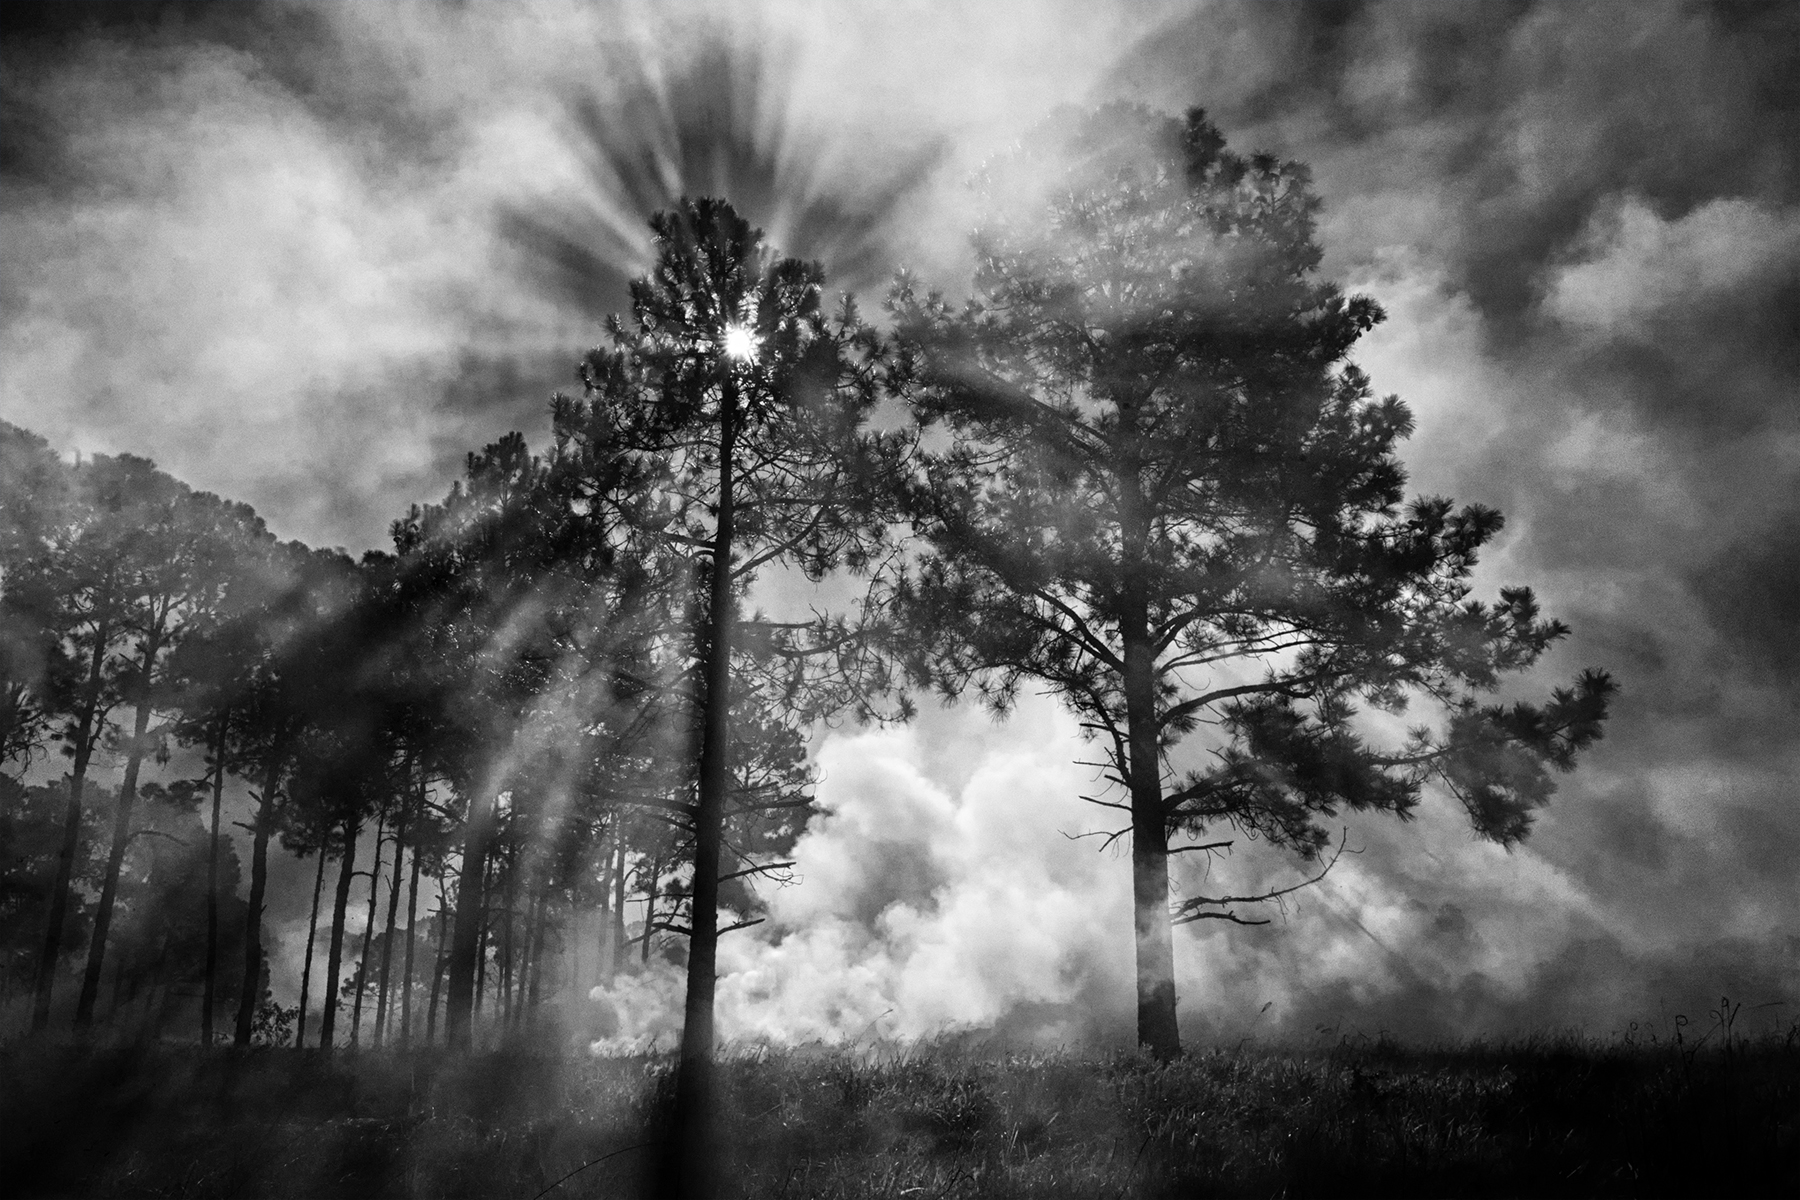 Breaking Through The Smoke